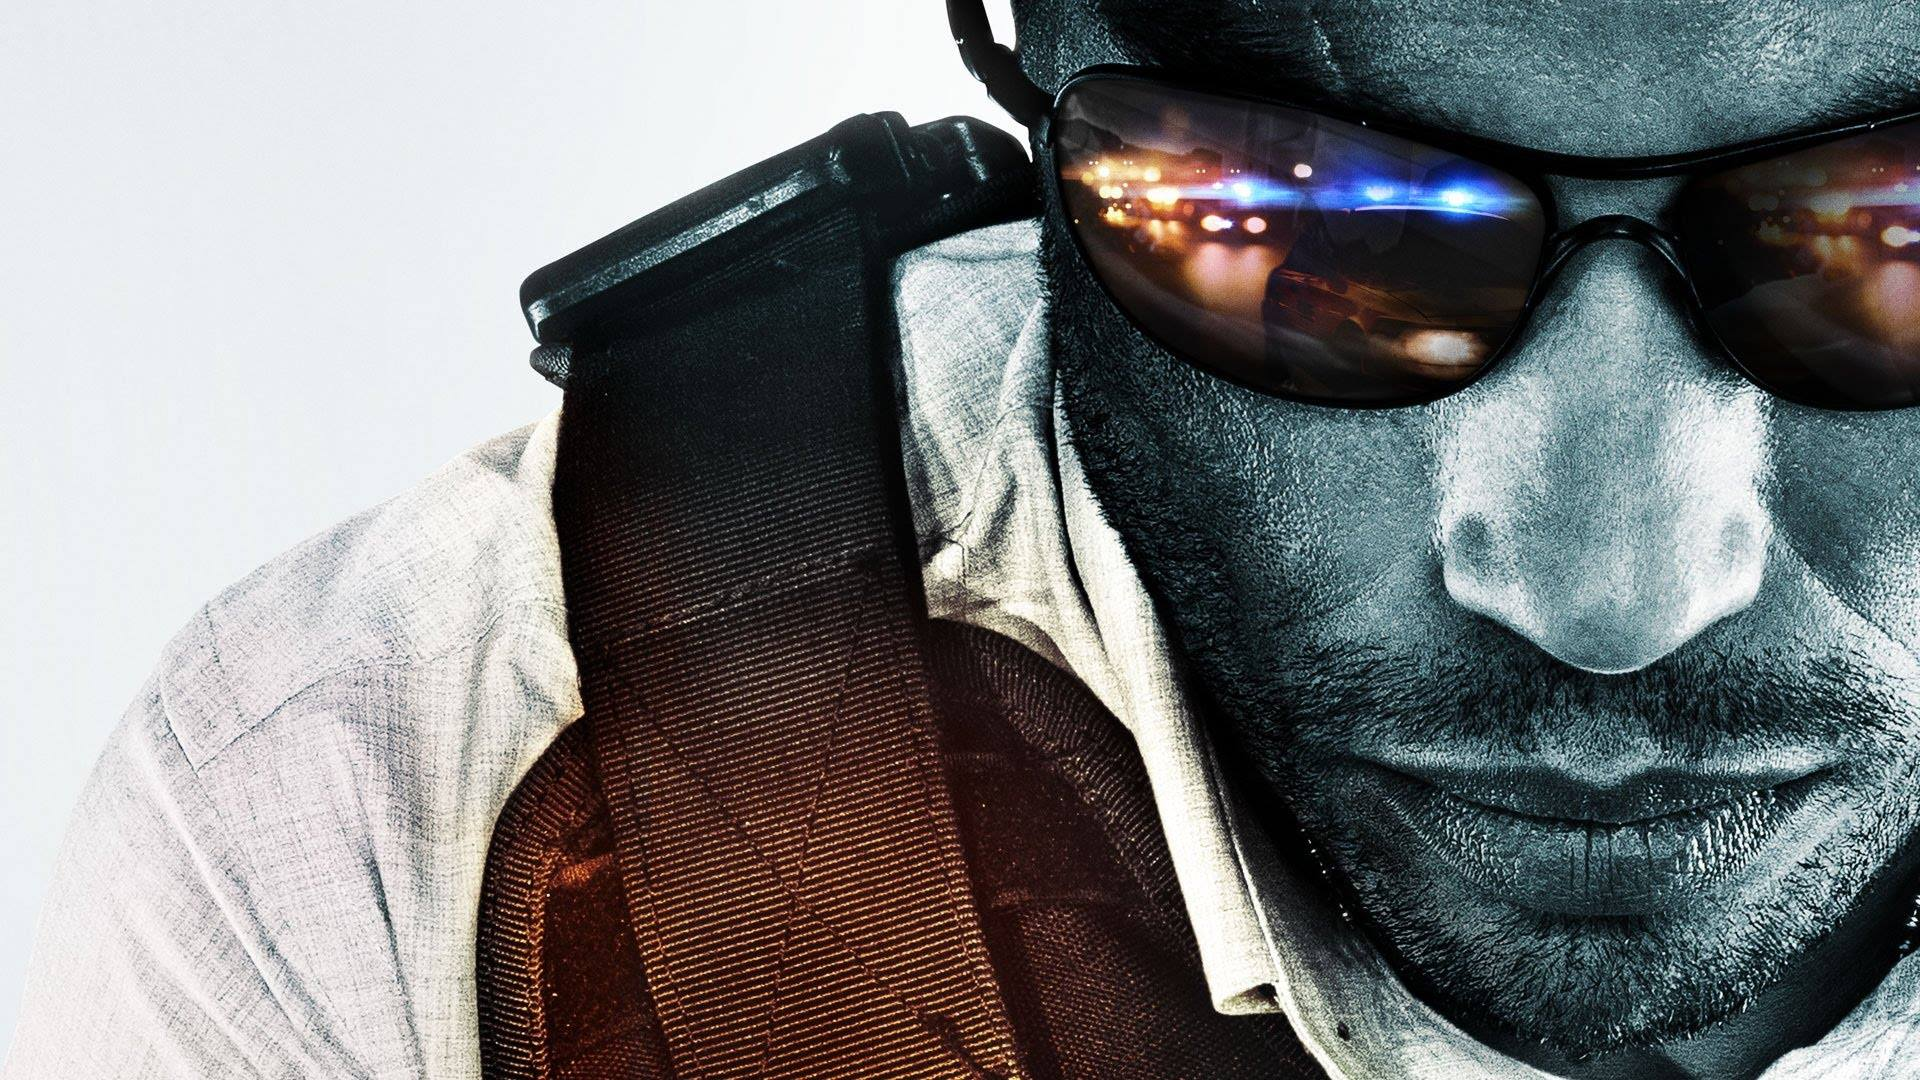 battlefield_hardline-HD